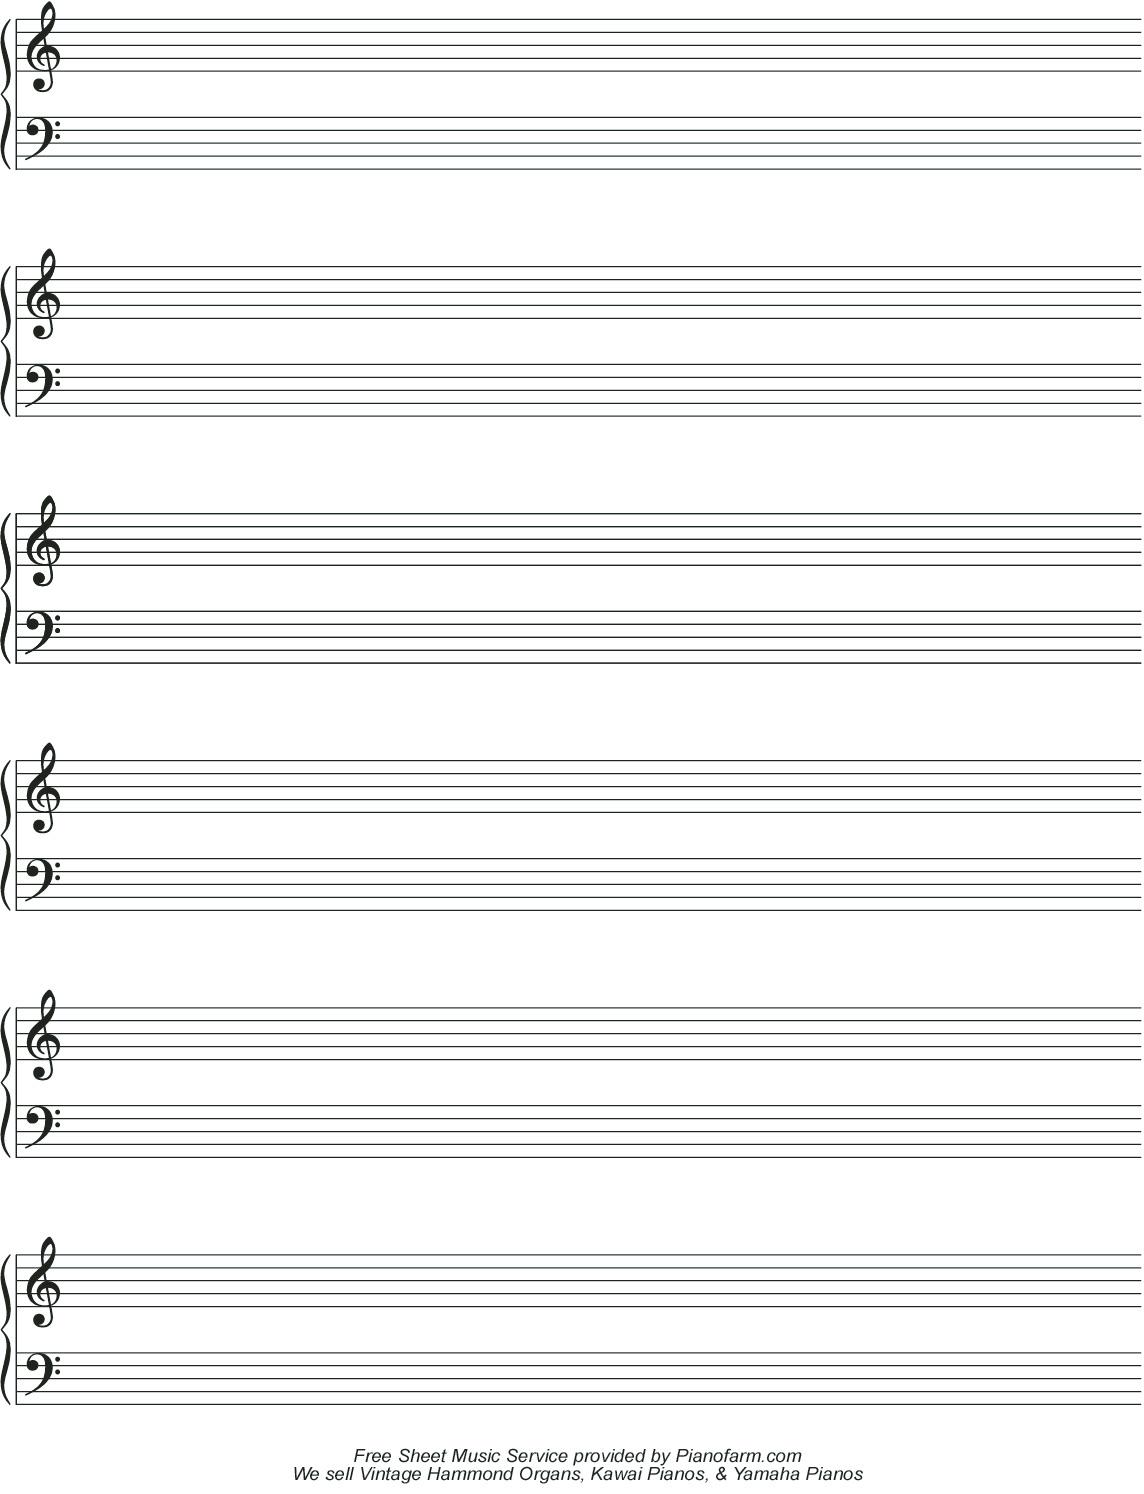 Free Music Page - Pianofarm & Pianoorgandepot Harvesting - Free Printable Blank Music Staff Paper